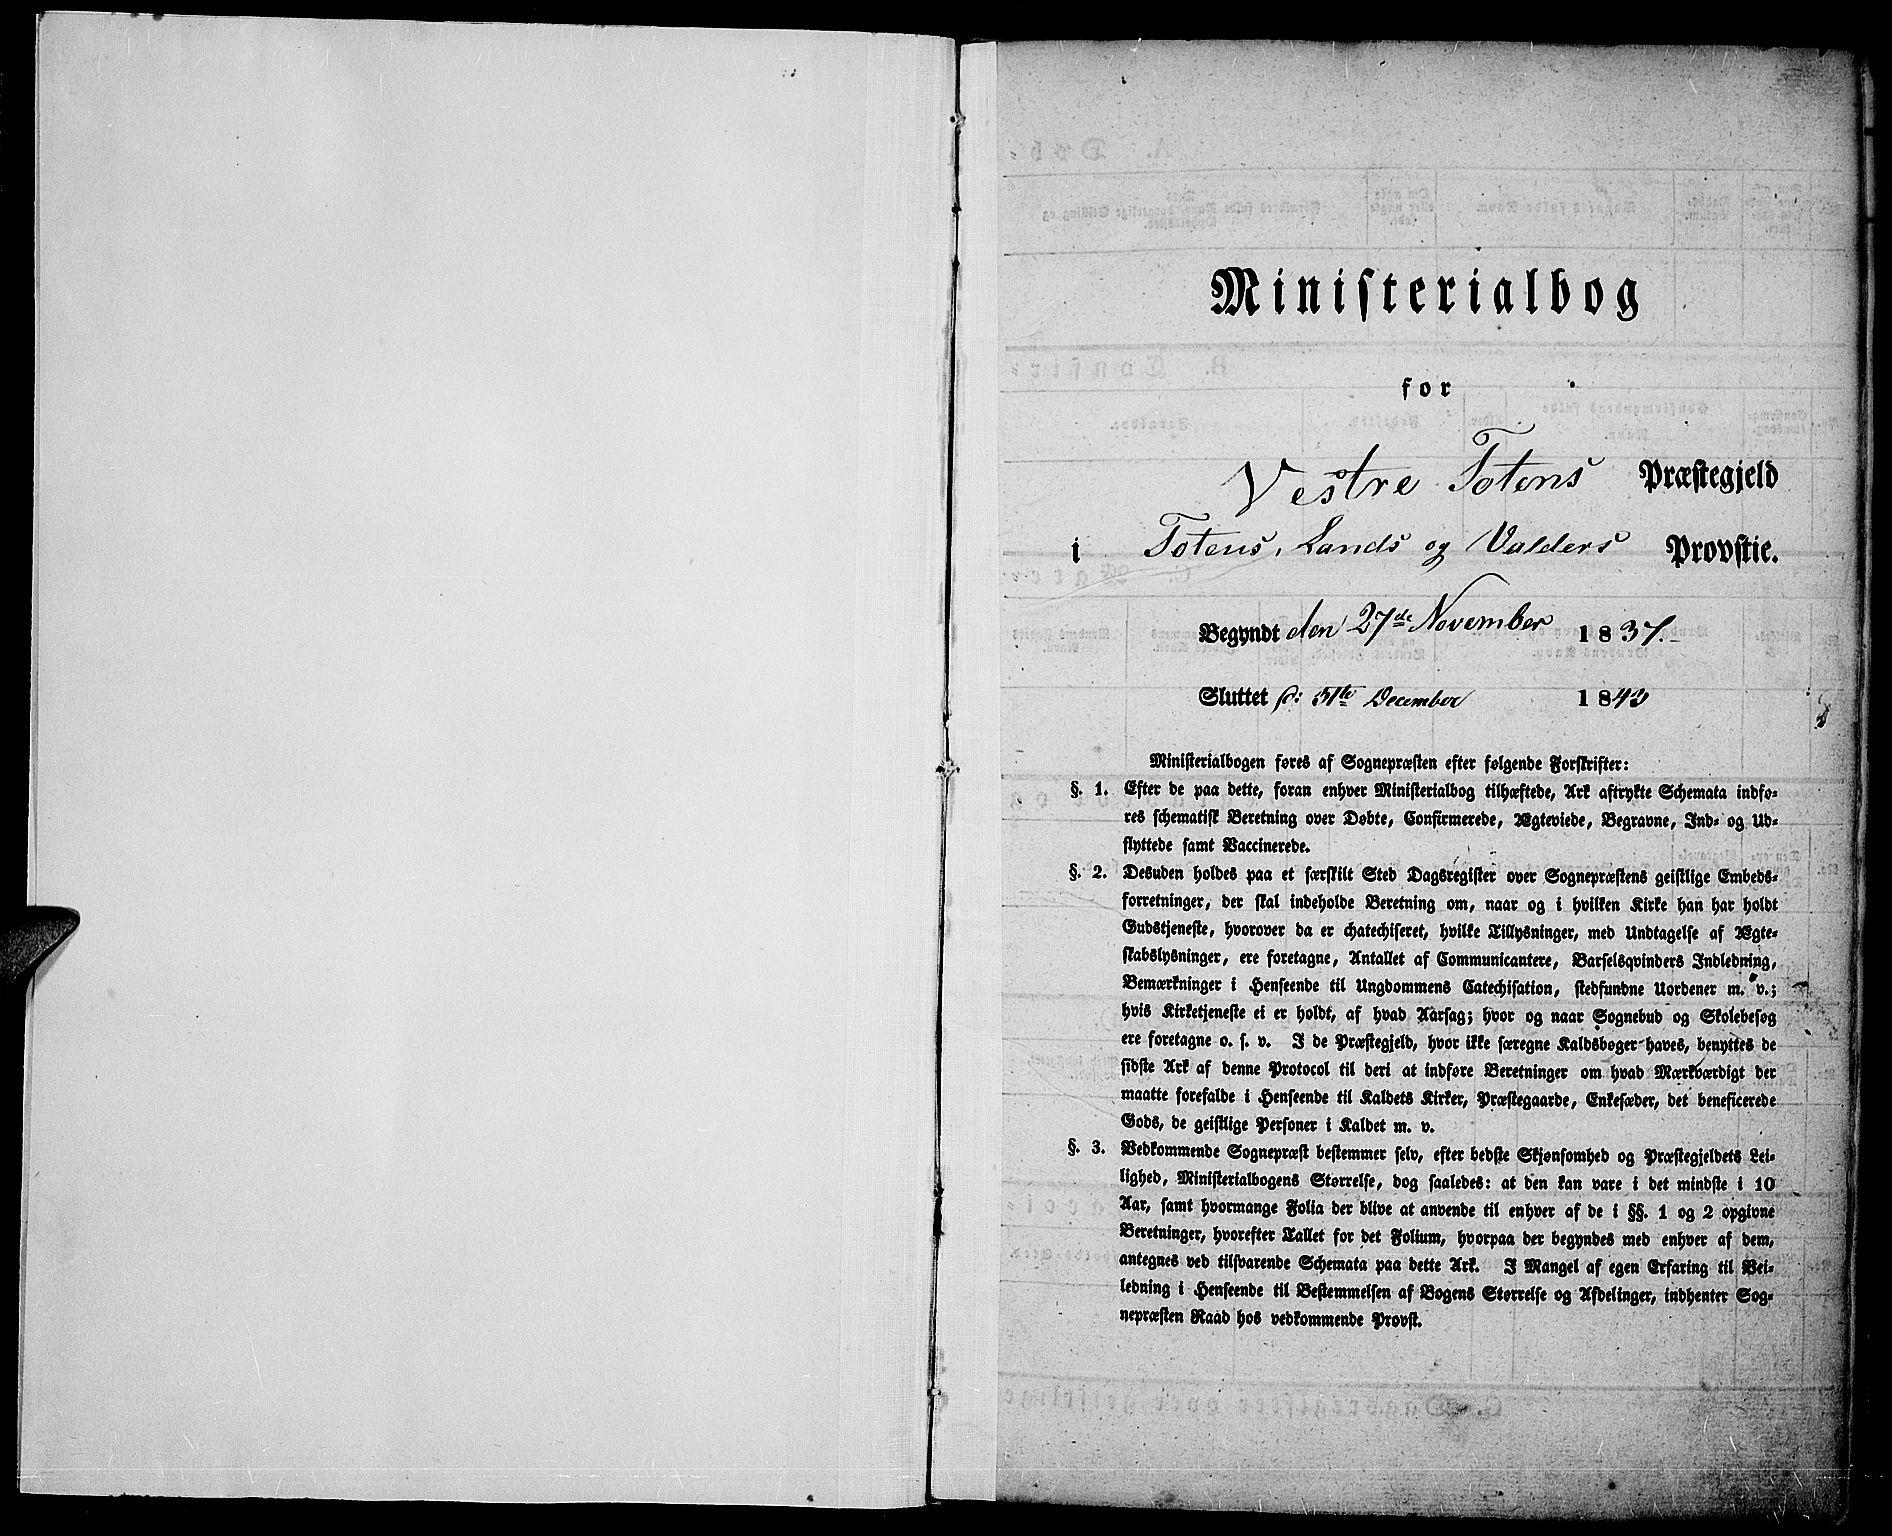 SAH, Vestre Toten prestekontor, Ministerialbok nr. 3, 1836-1843